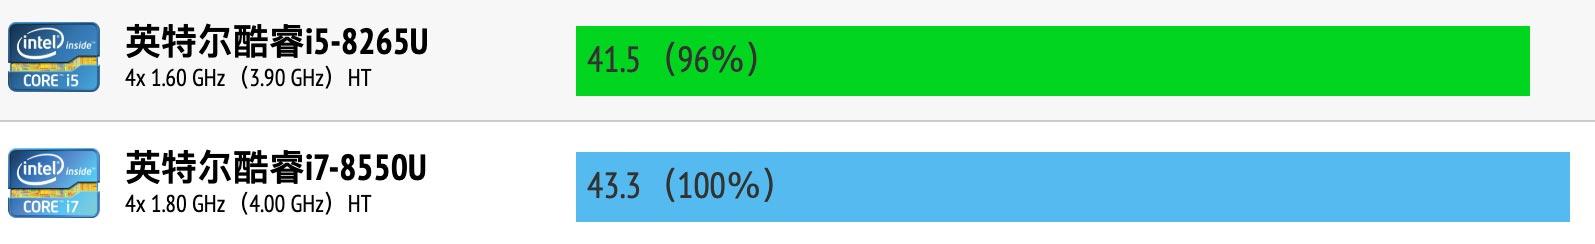 Intel Core i5-8265U和i7-8550U性能跑分对比评测